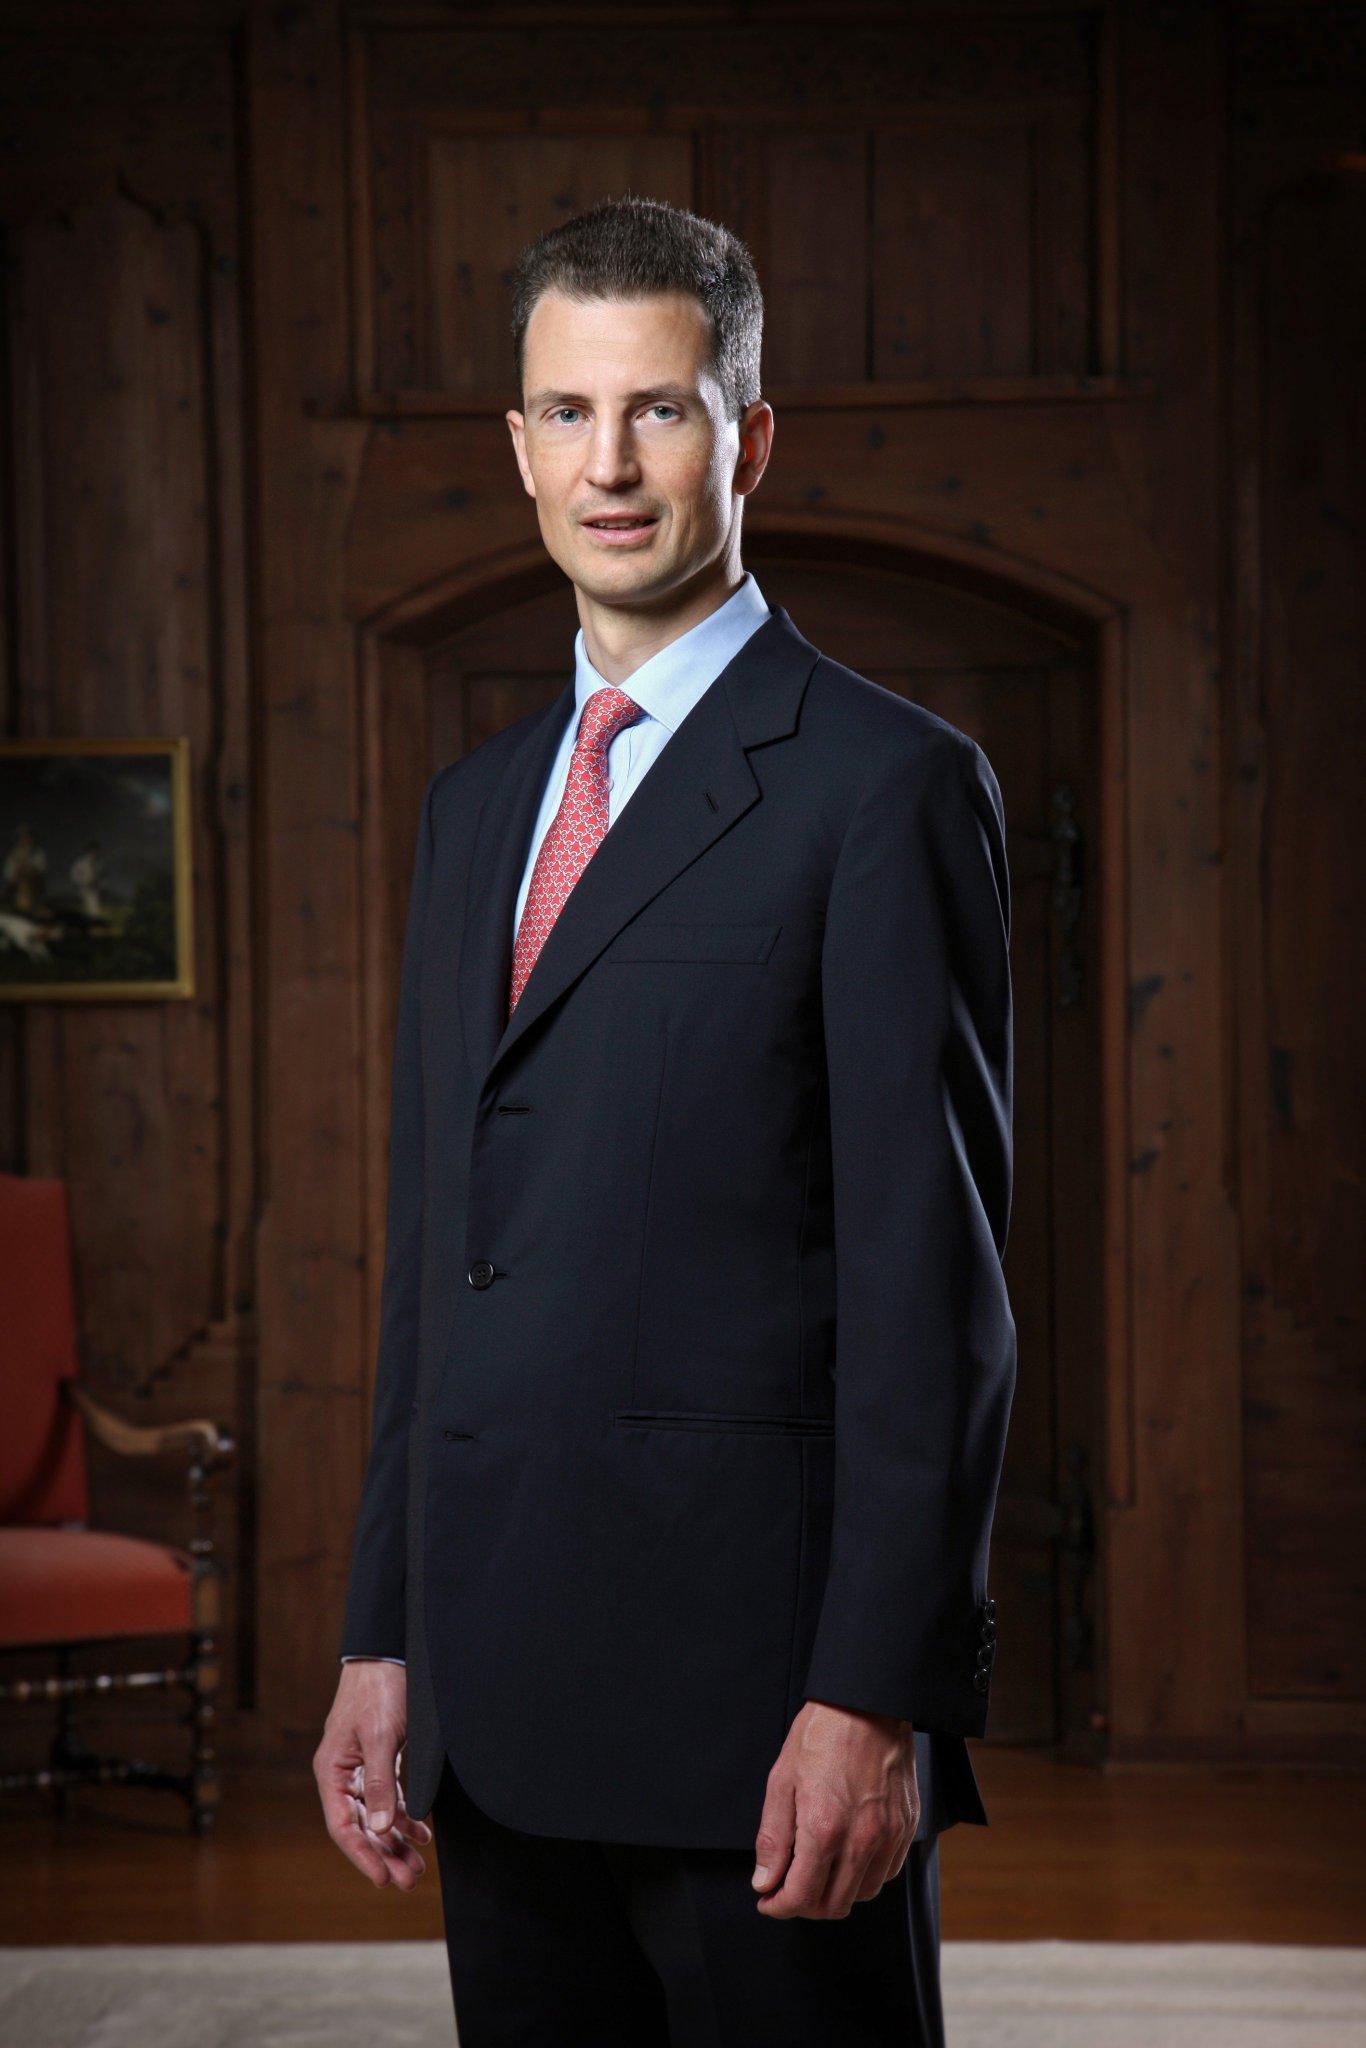 Happy Birthday Alois, Hereditary Prince of Liechtenstein! He turned 52 today!